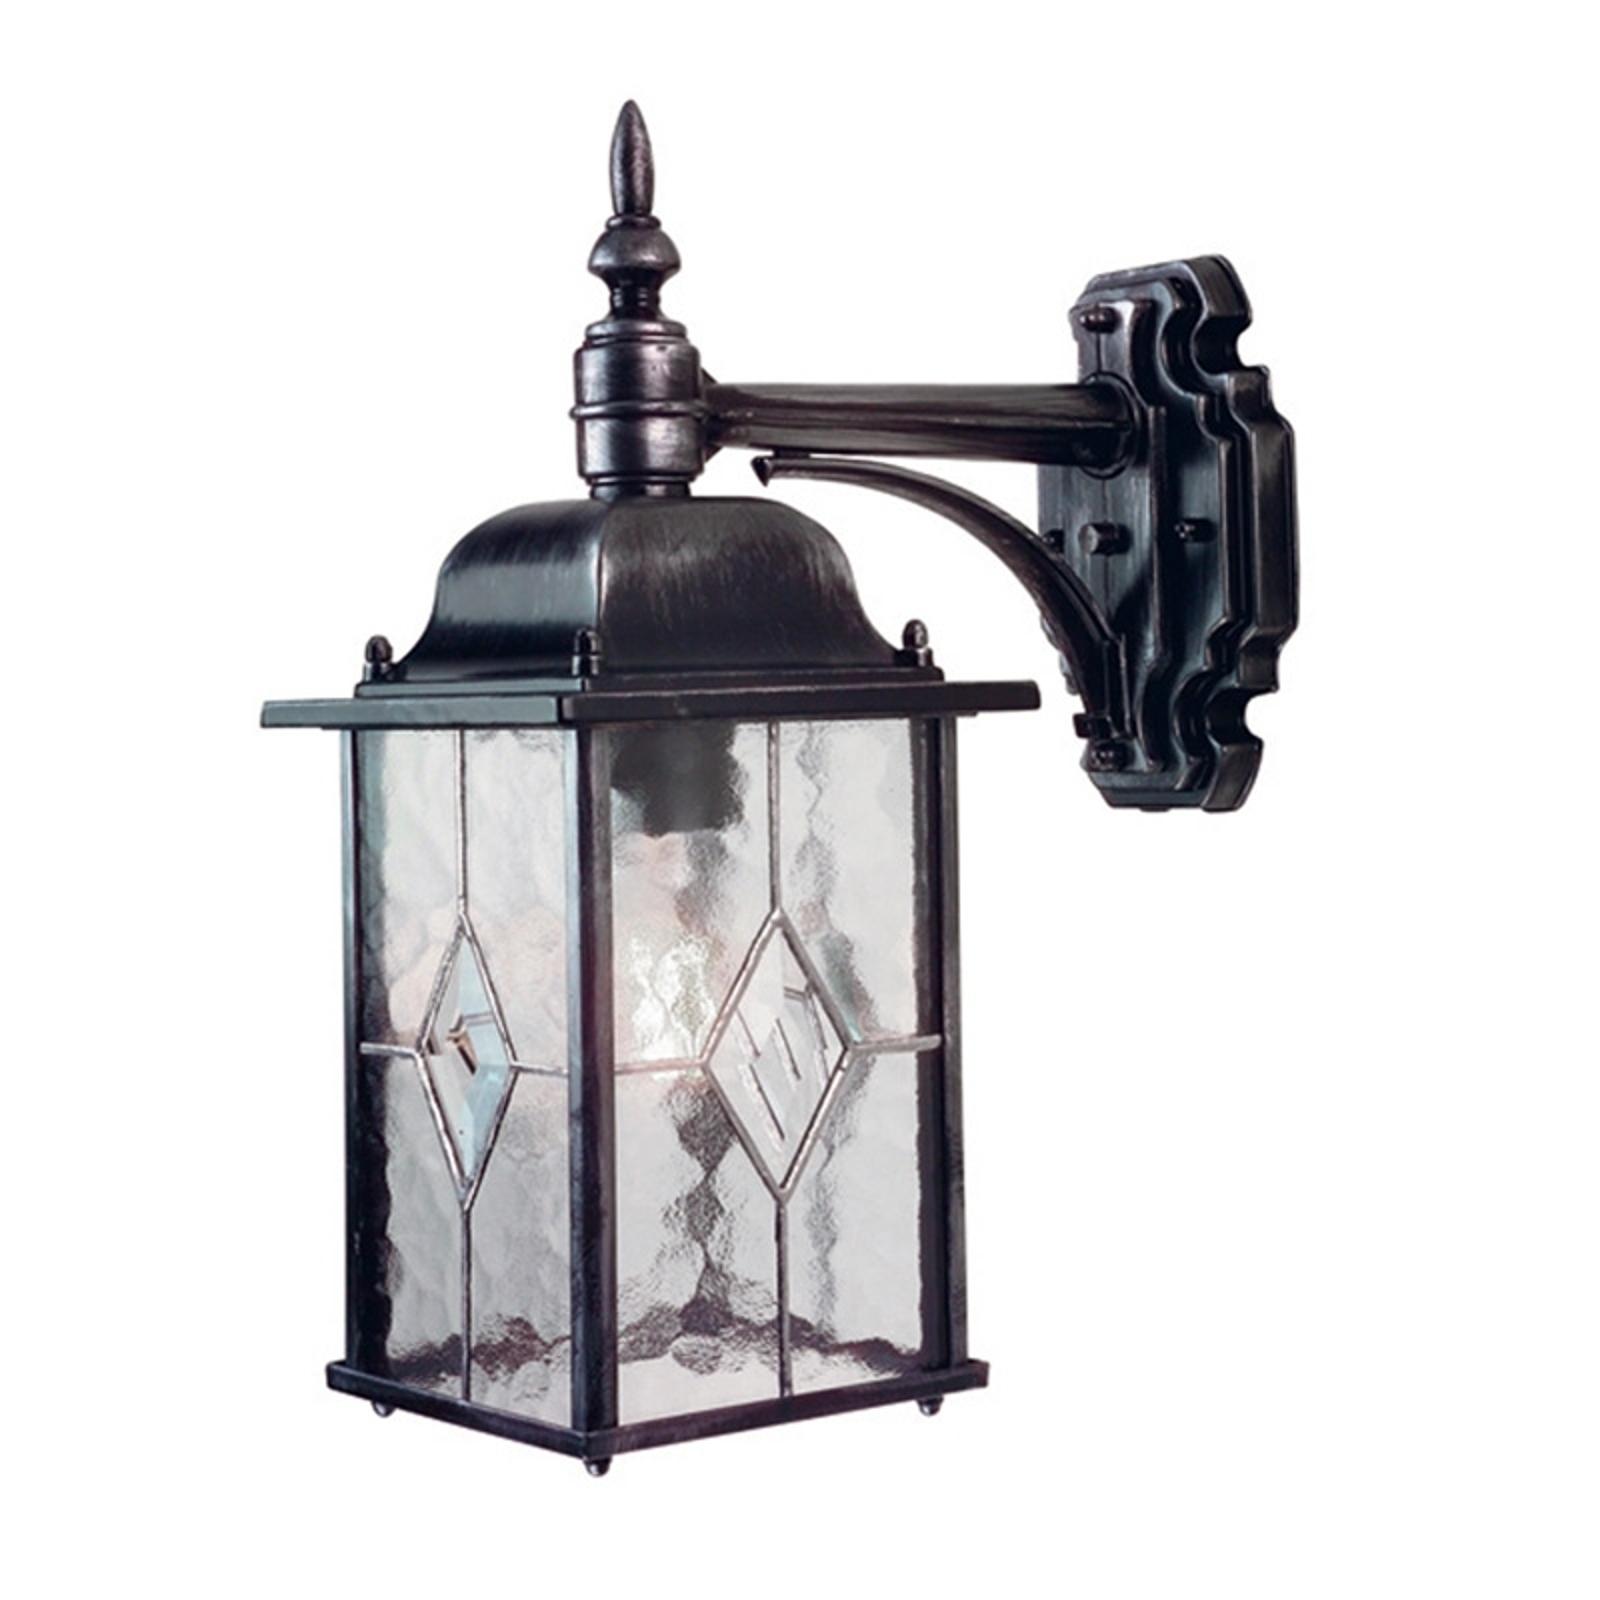 Buitenwandlamp WEXFORD in lantaarnvorm